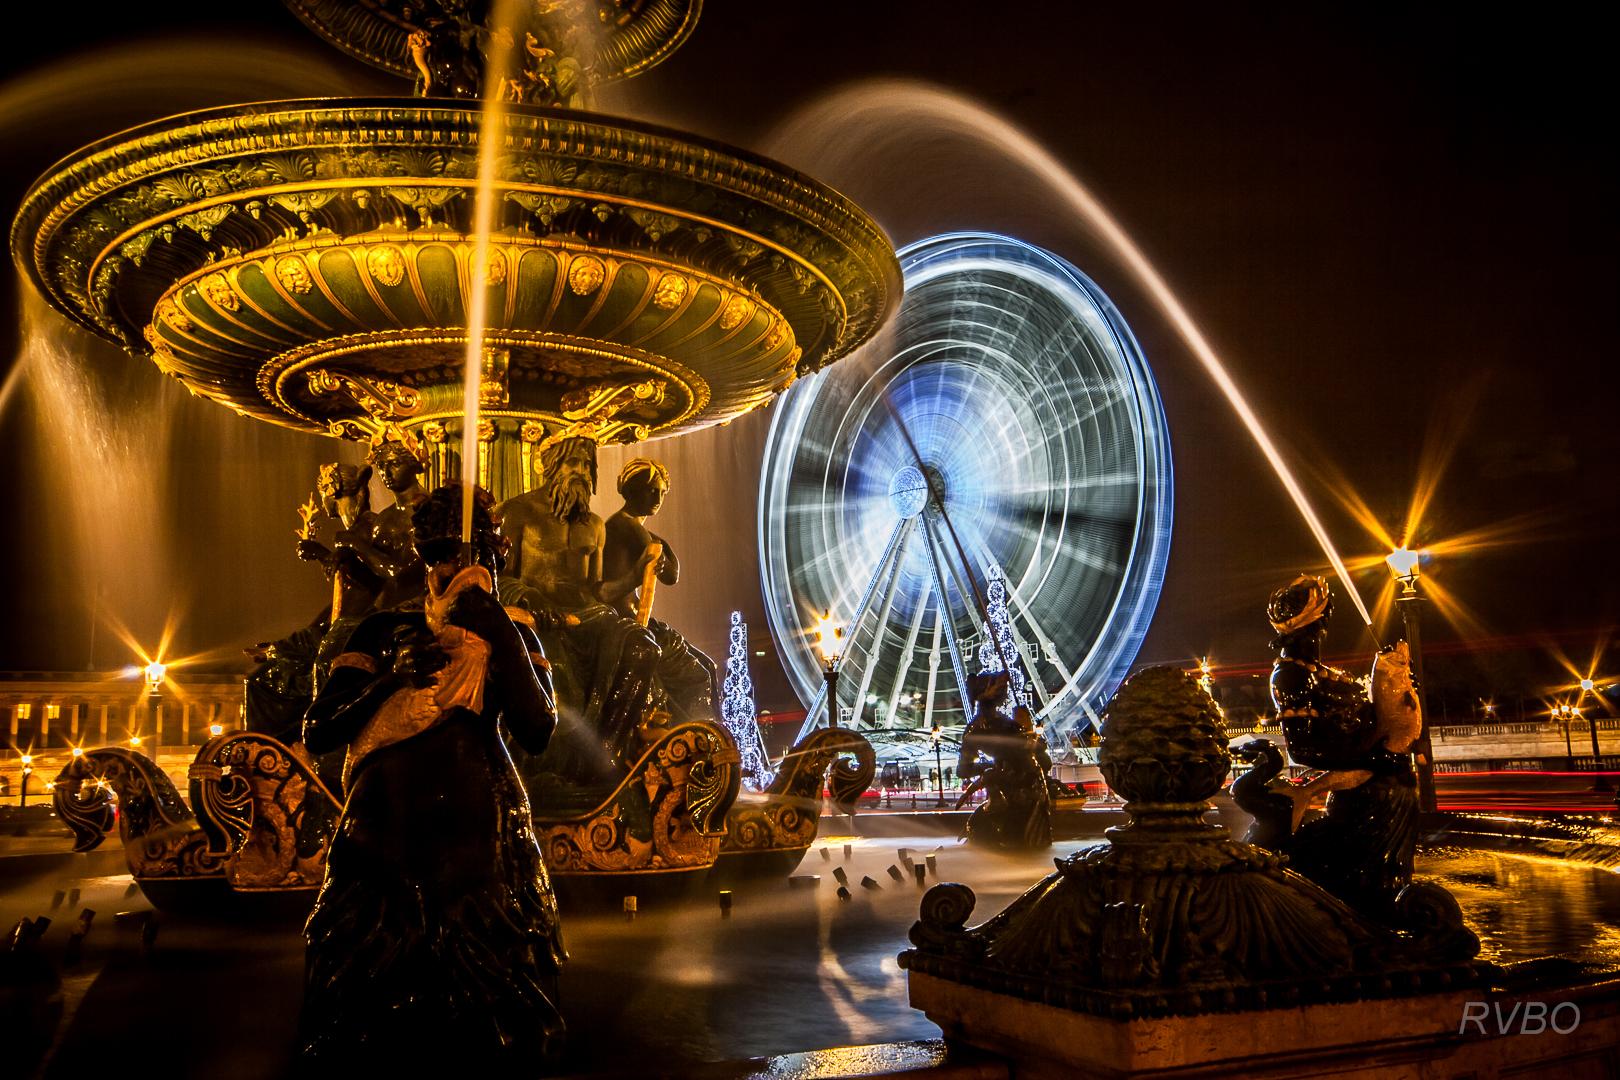 Sfondi città notte parigi metropoli fontana concorde